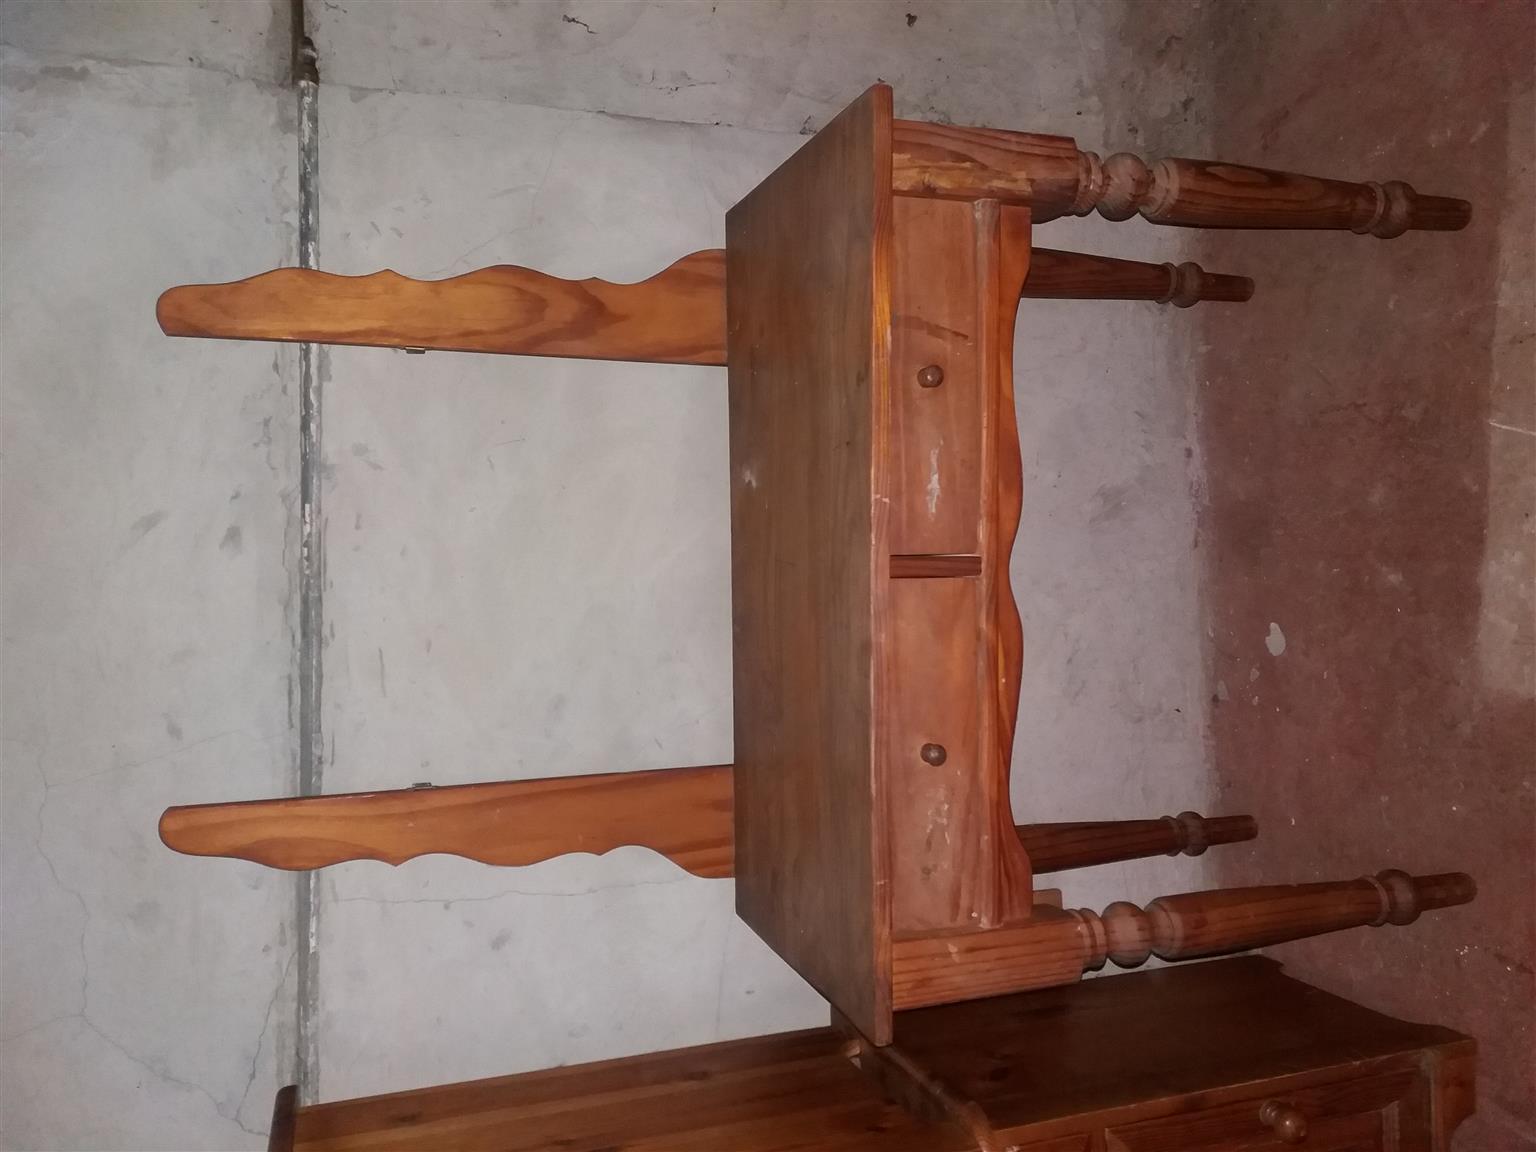 Oregon Pine furniture in good condition